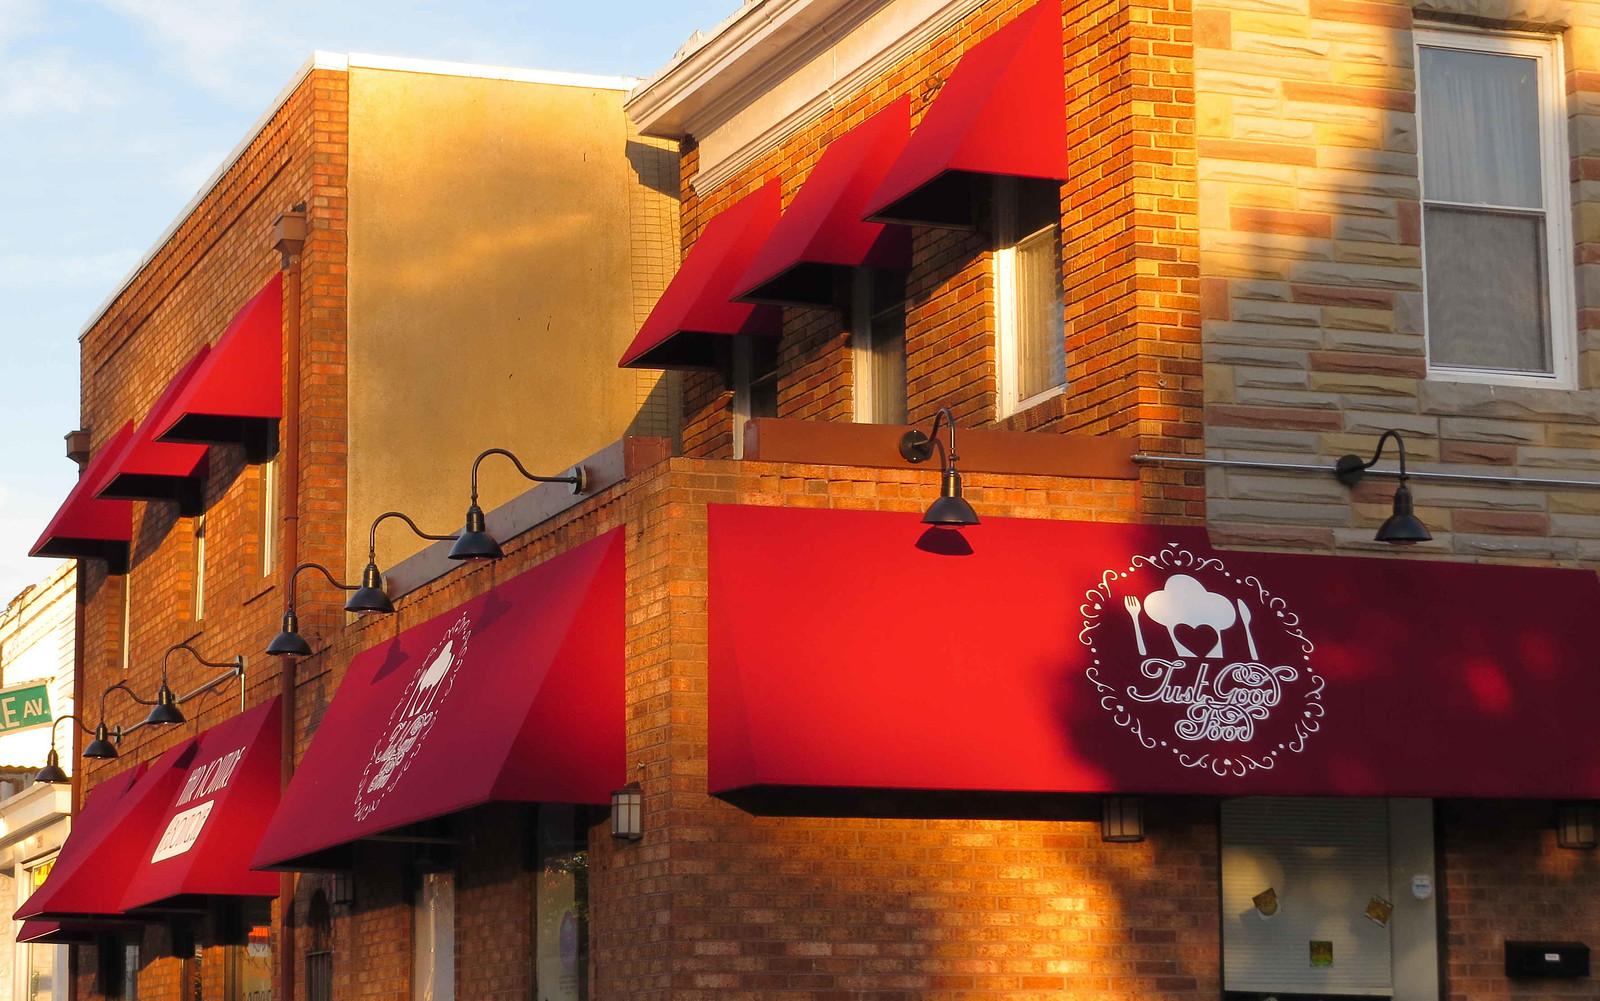 Restaurant Awnings and Logo Design Baltimore